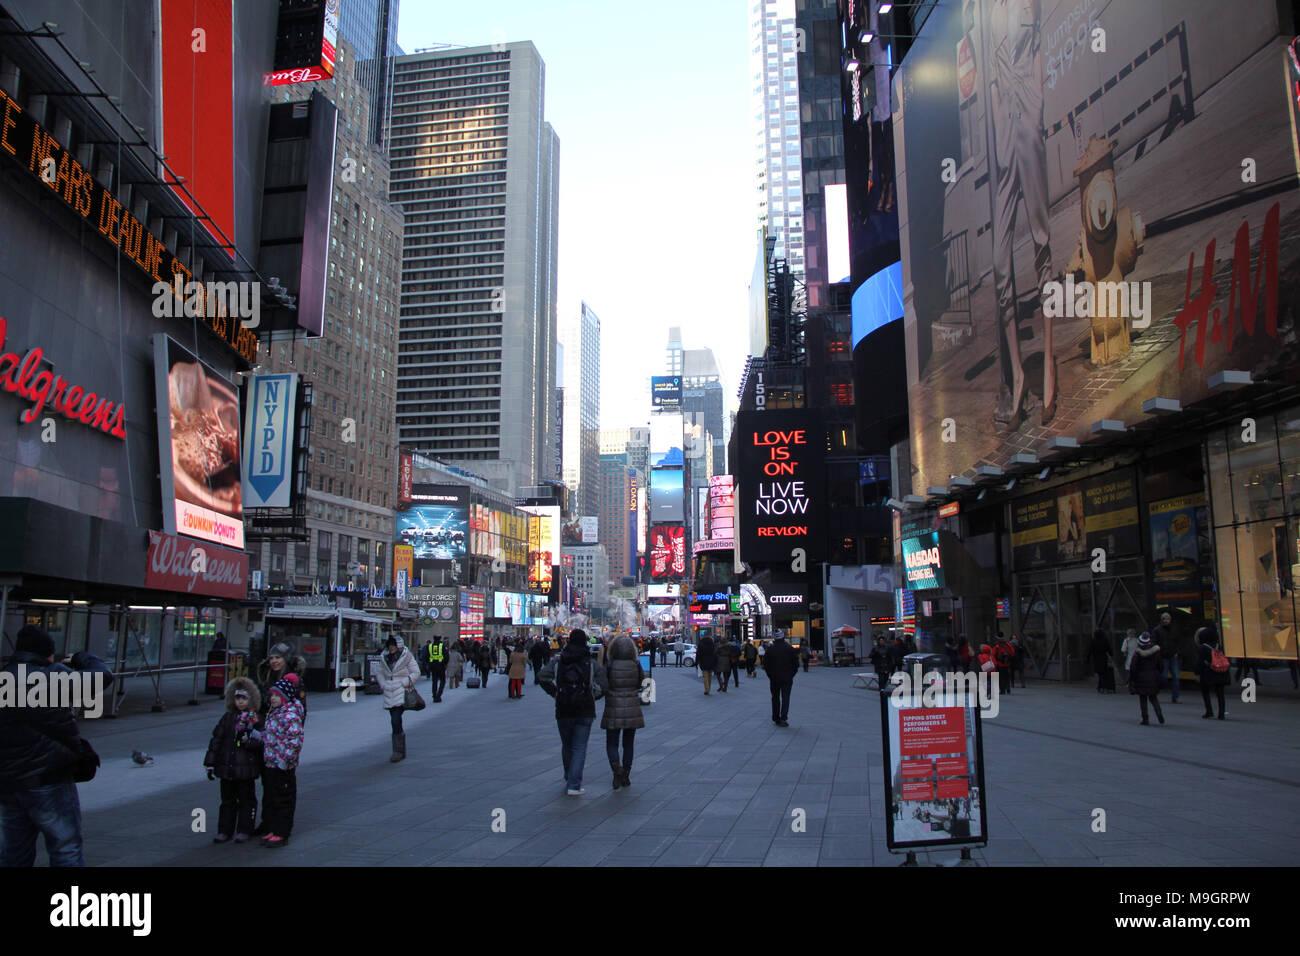 7th Avenue, Times Square, New York, Vereinigte Staaten Stockbild